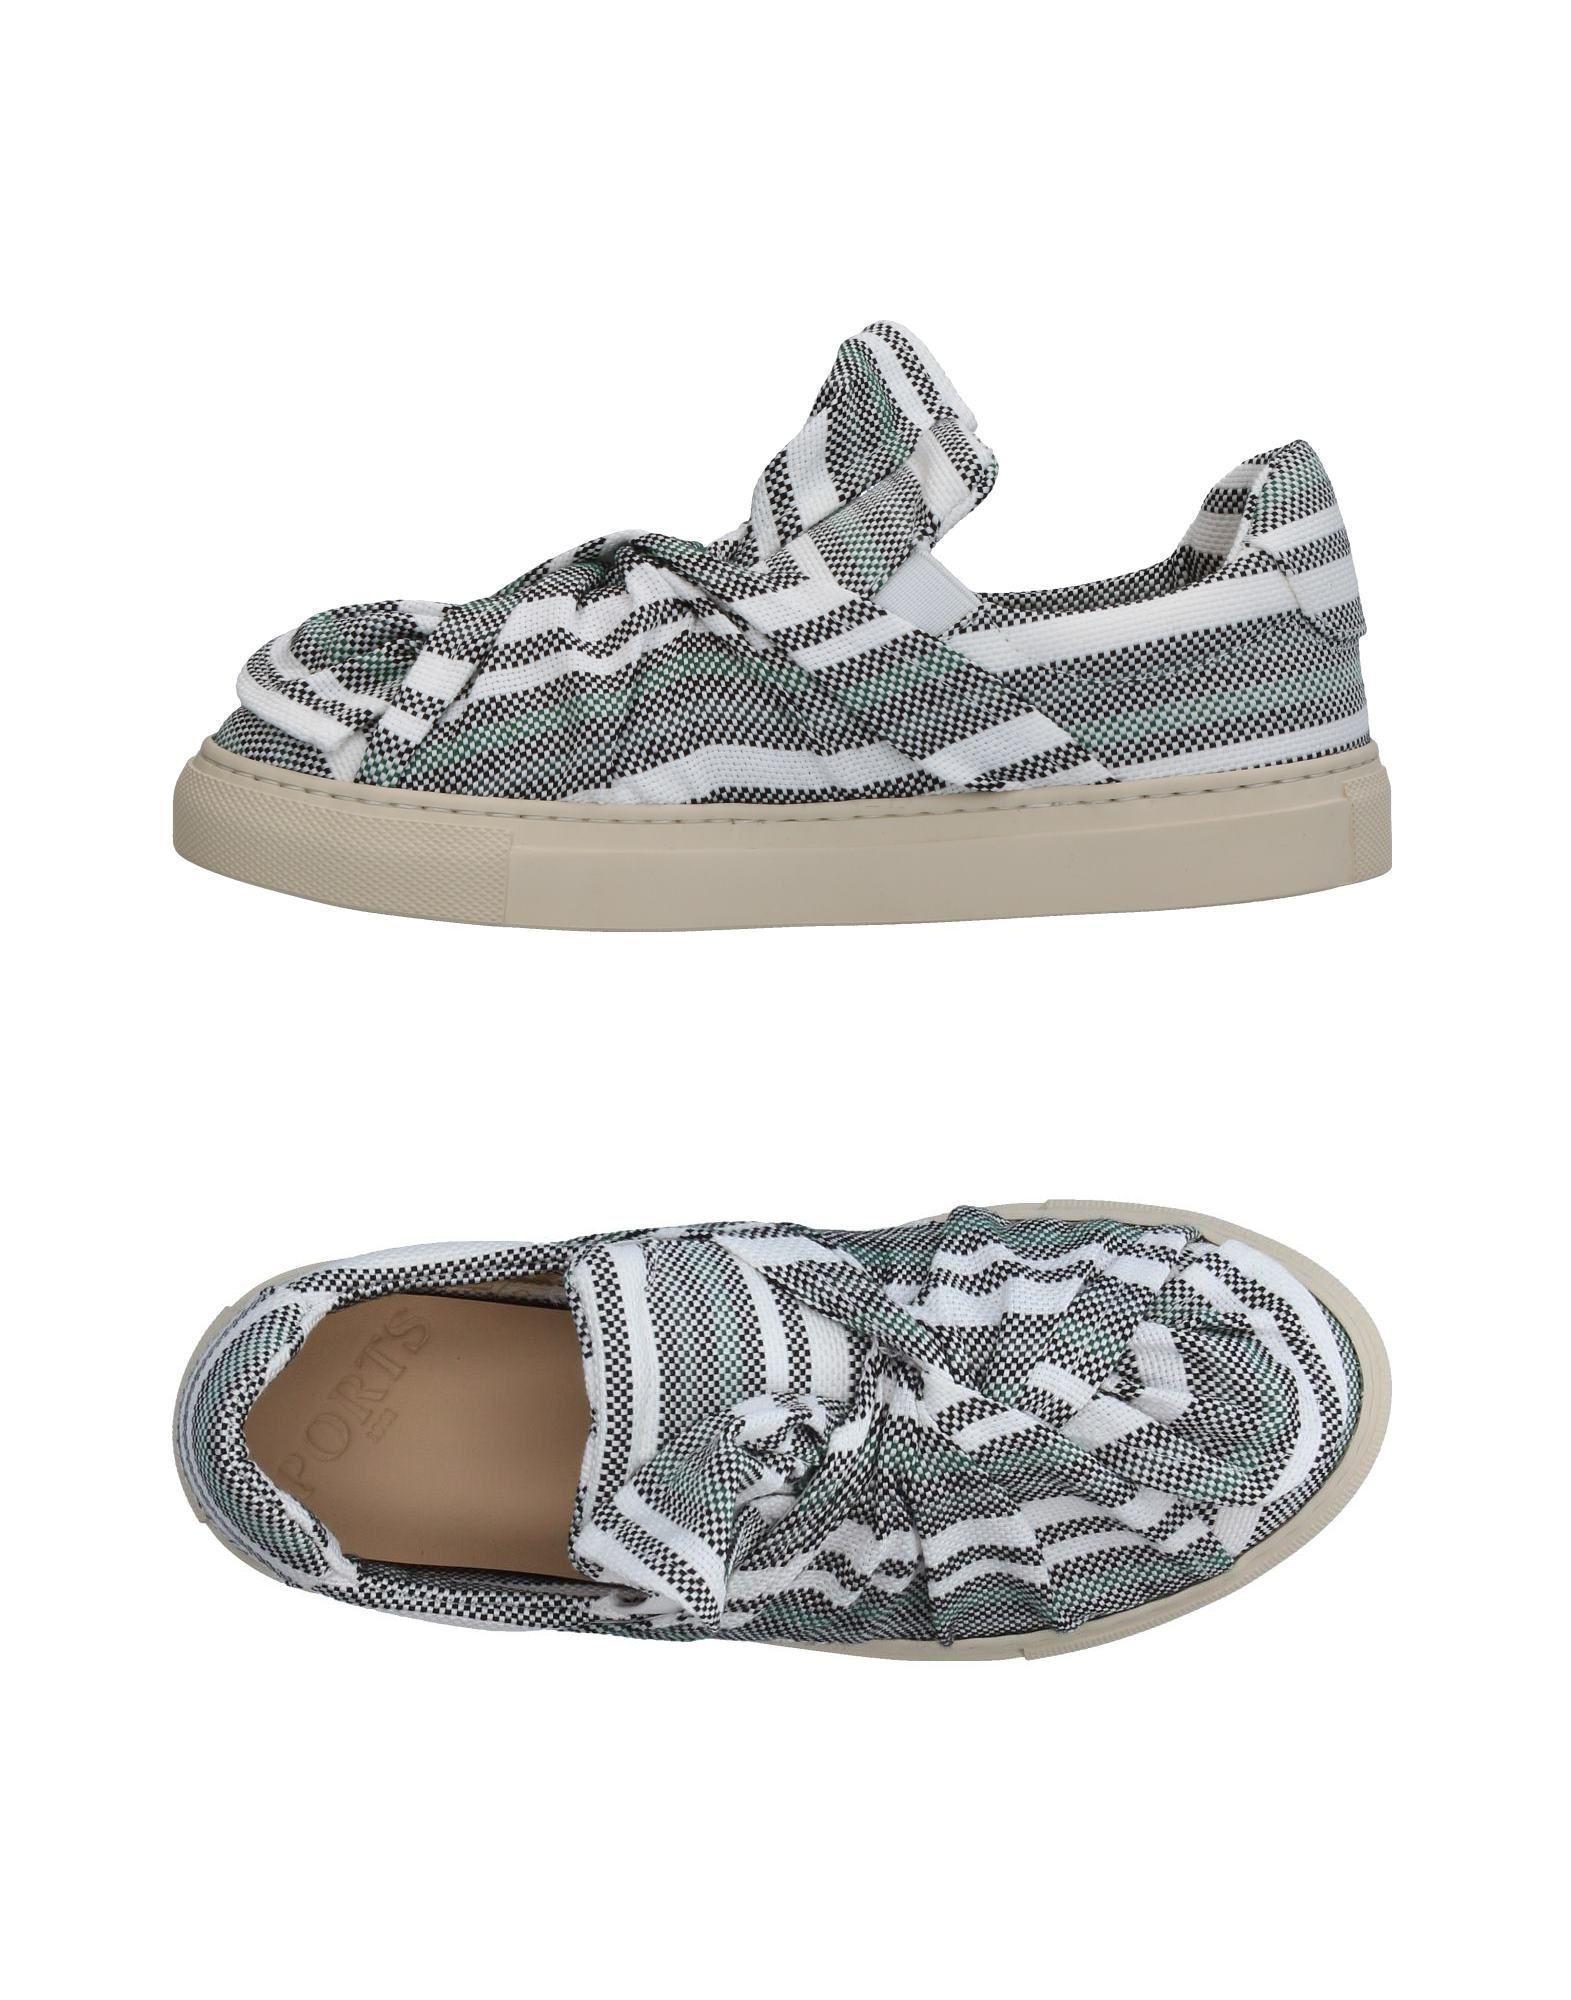 FOOTWEAR - Low-tops & sneakers Ports 1961 2018 Unisex Excellent jQ8uU34